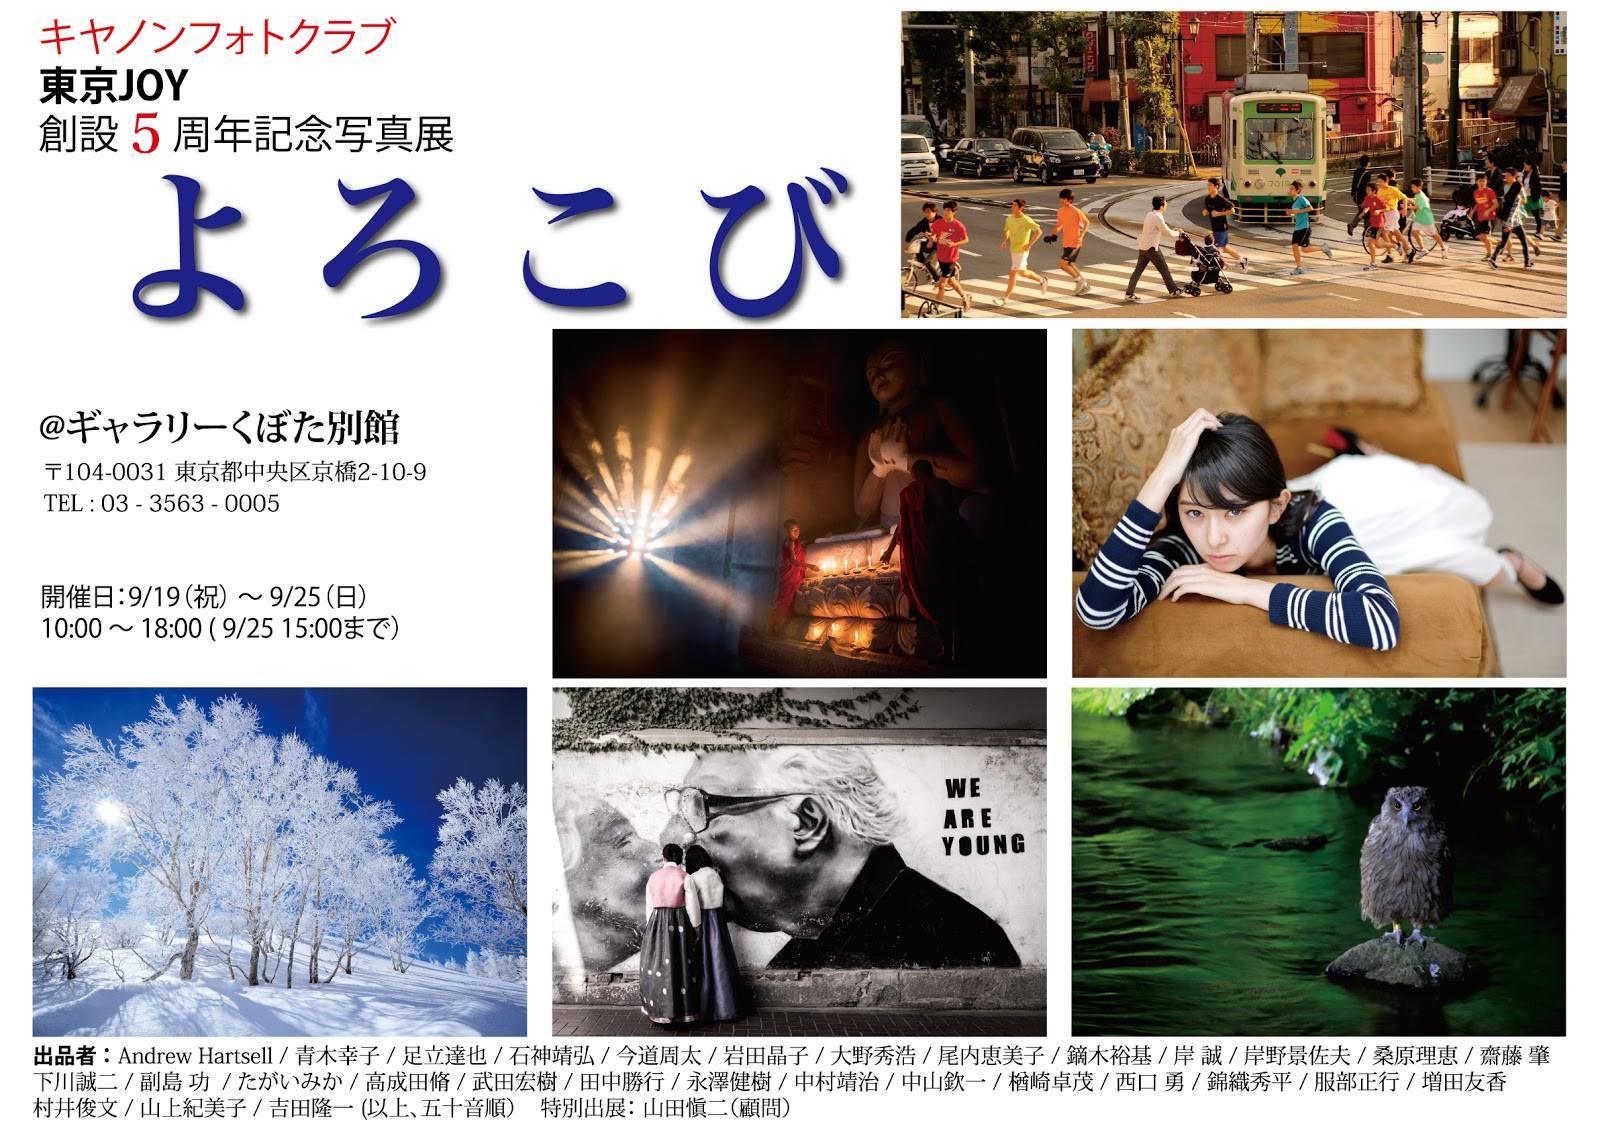 Photo Exhibition ・・・写真展・・・_f0333031_04581022.jpg